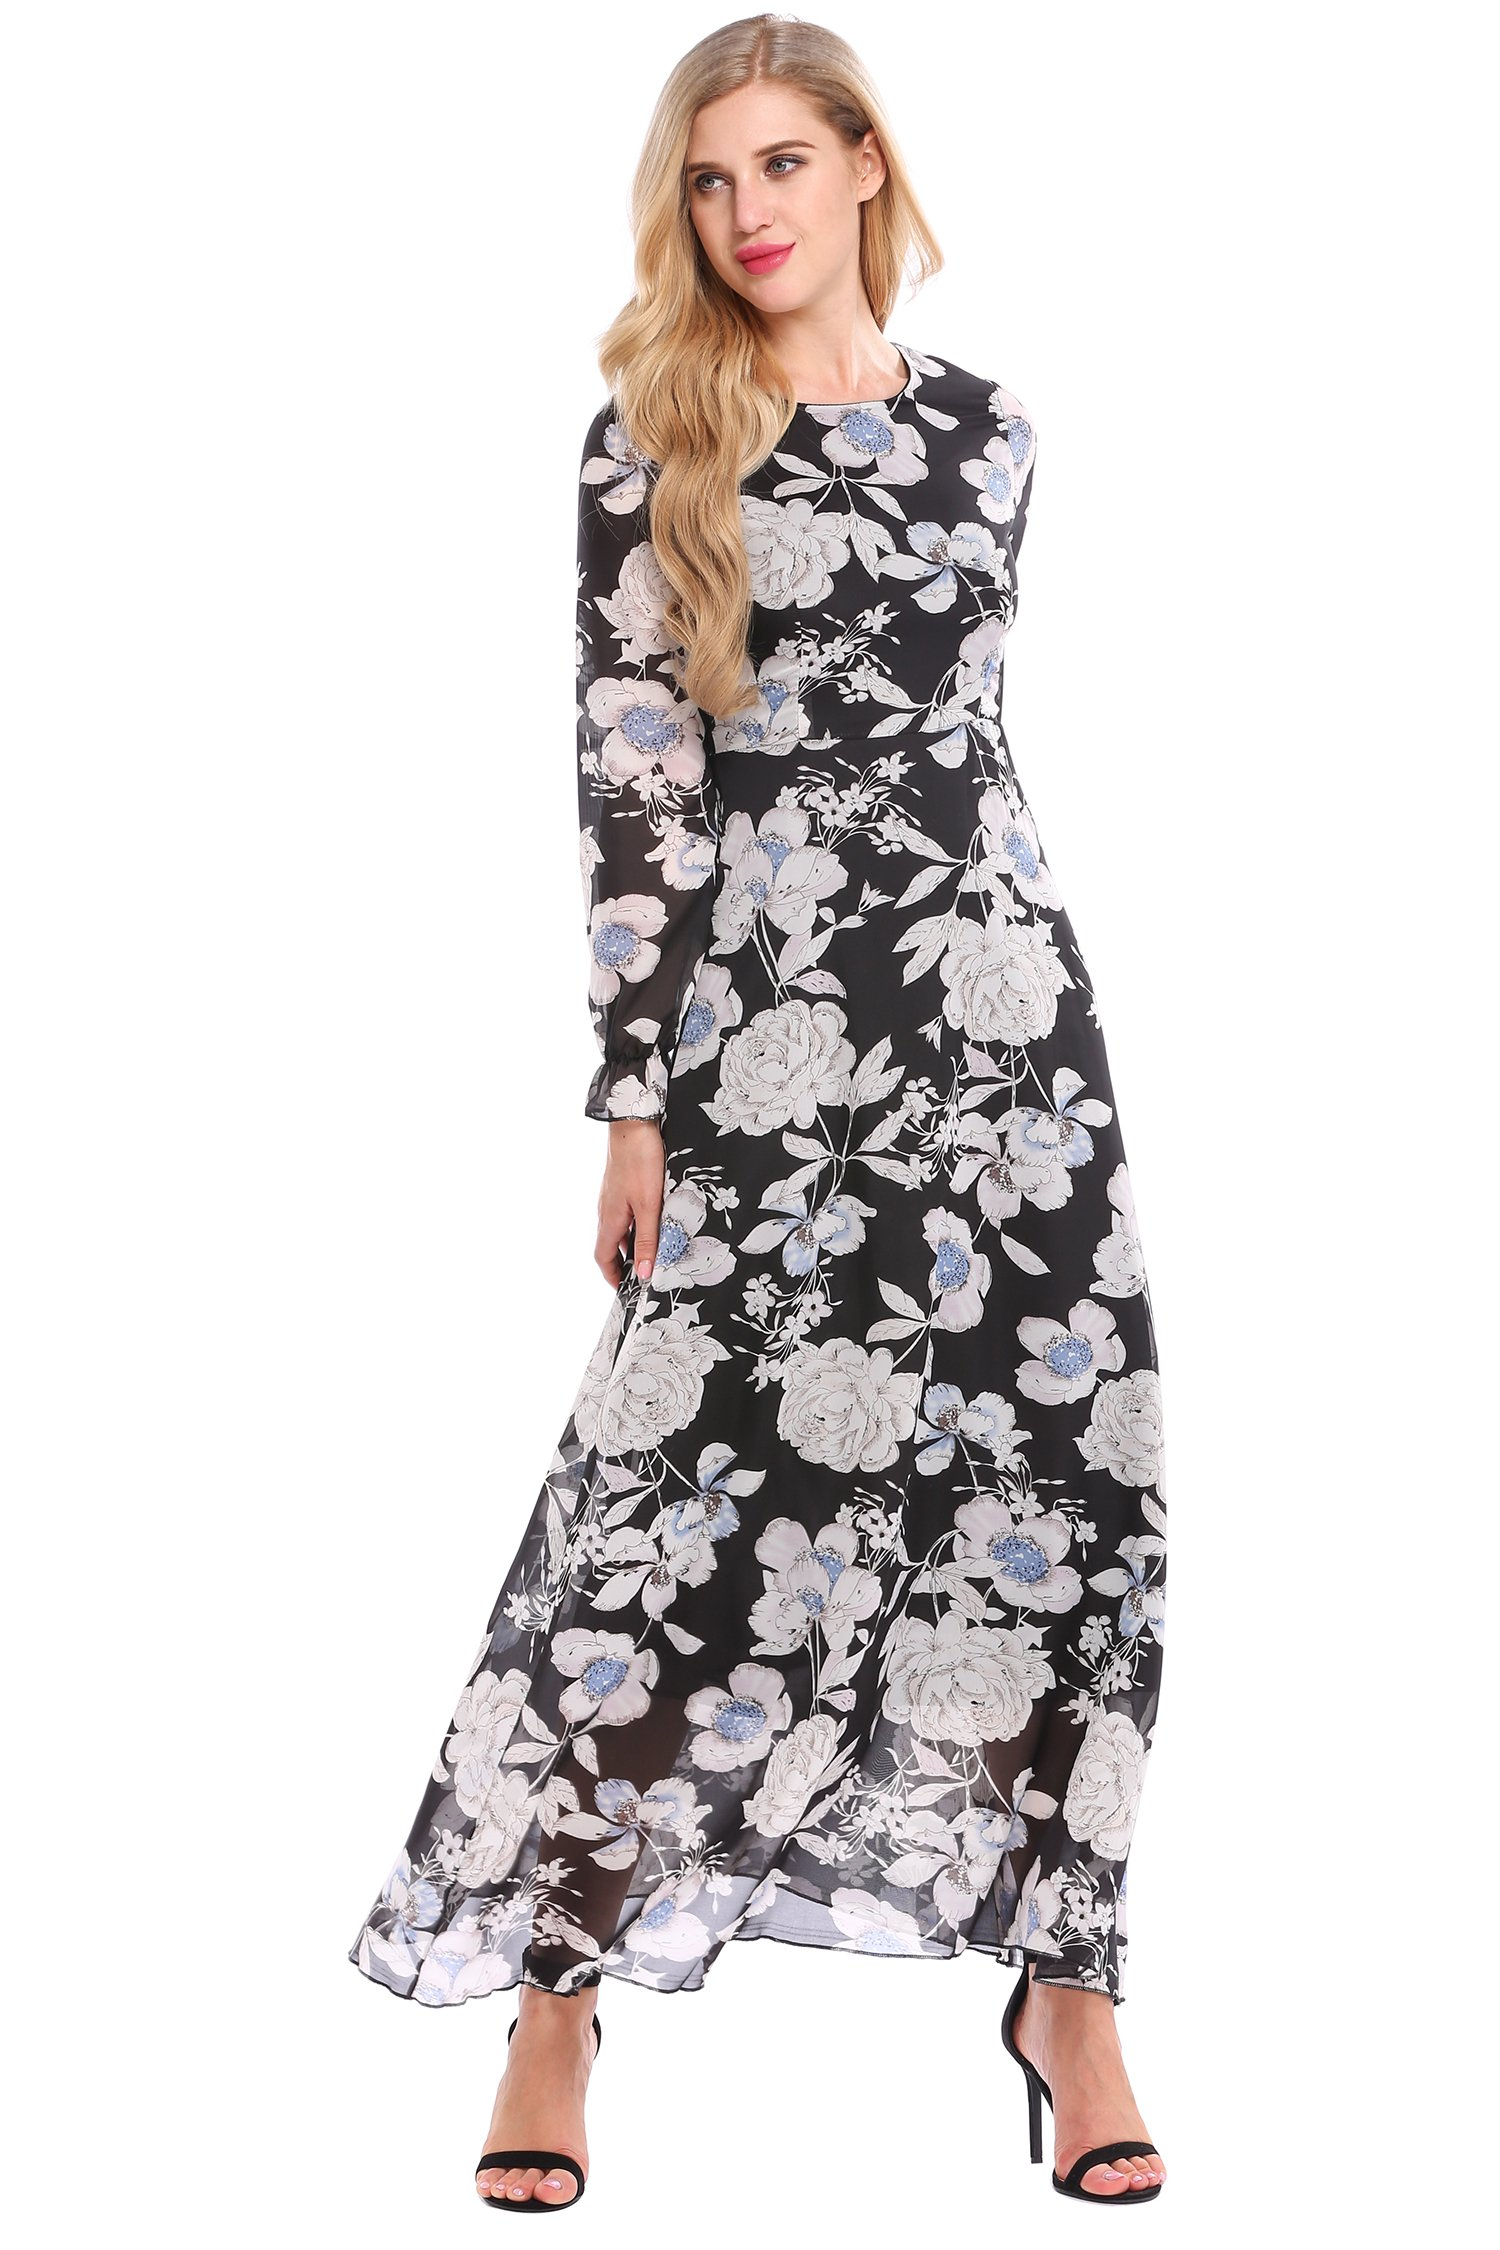 Zeagoo Women Chiffon O-Neck Long Sleeve Floral Print Long Maxi Party Beach Dress Black M